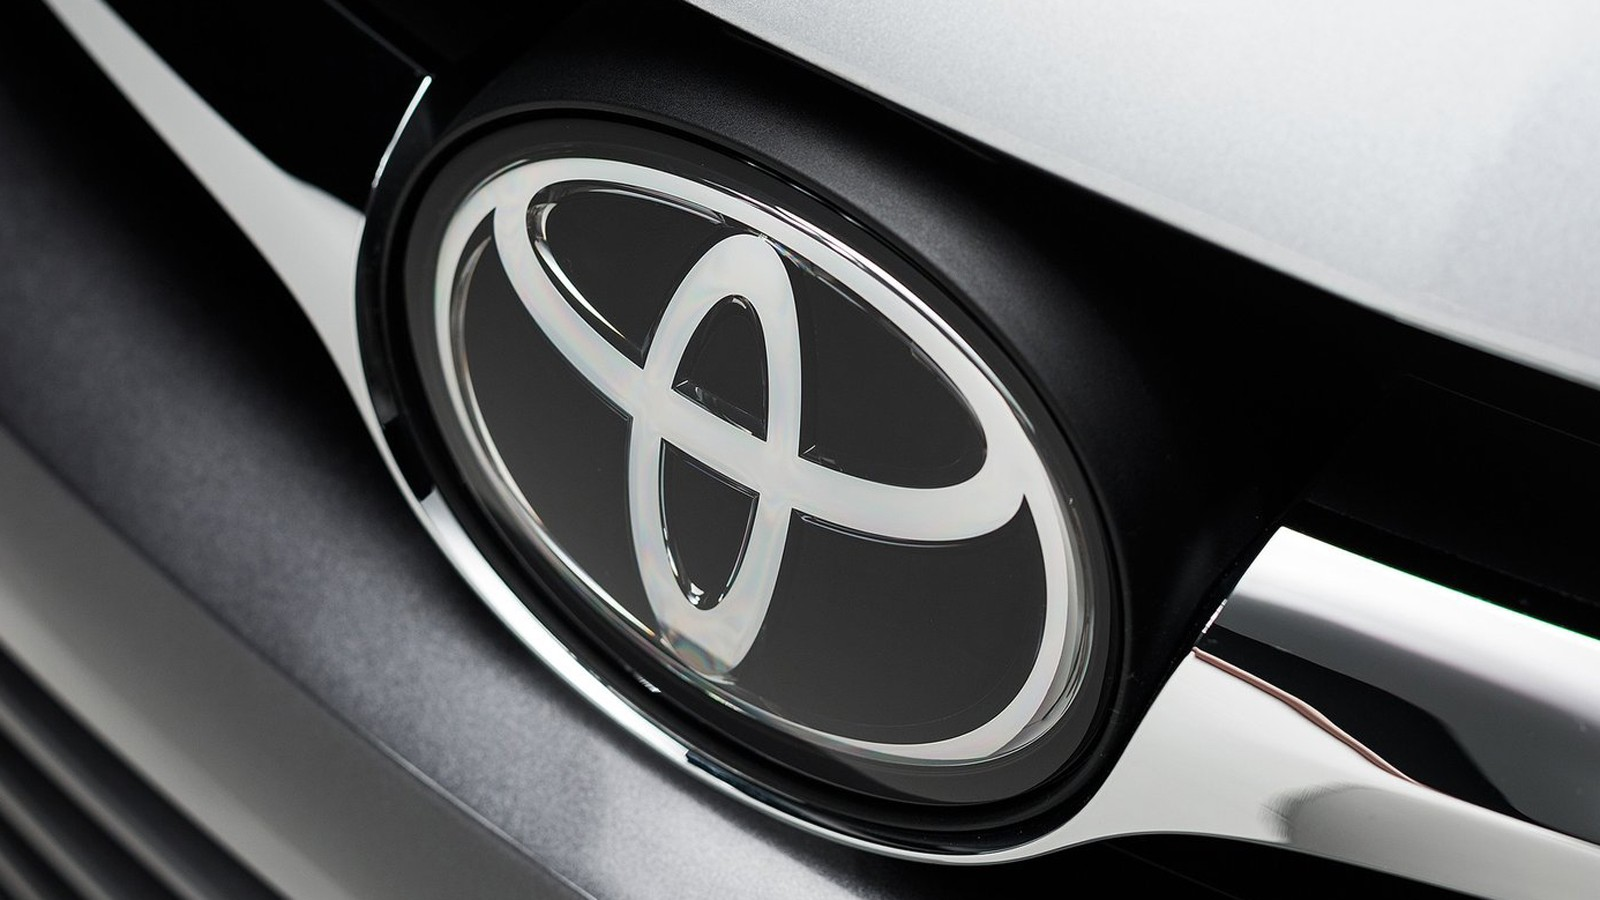 Toyota-Camry-2015-1600-4c